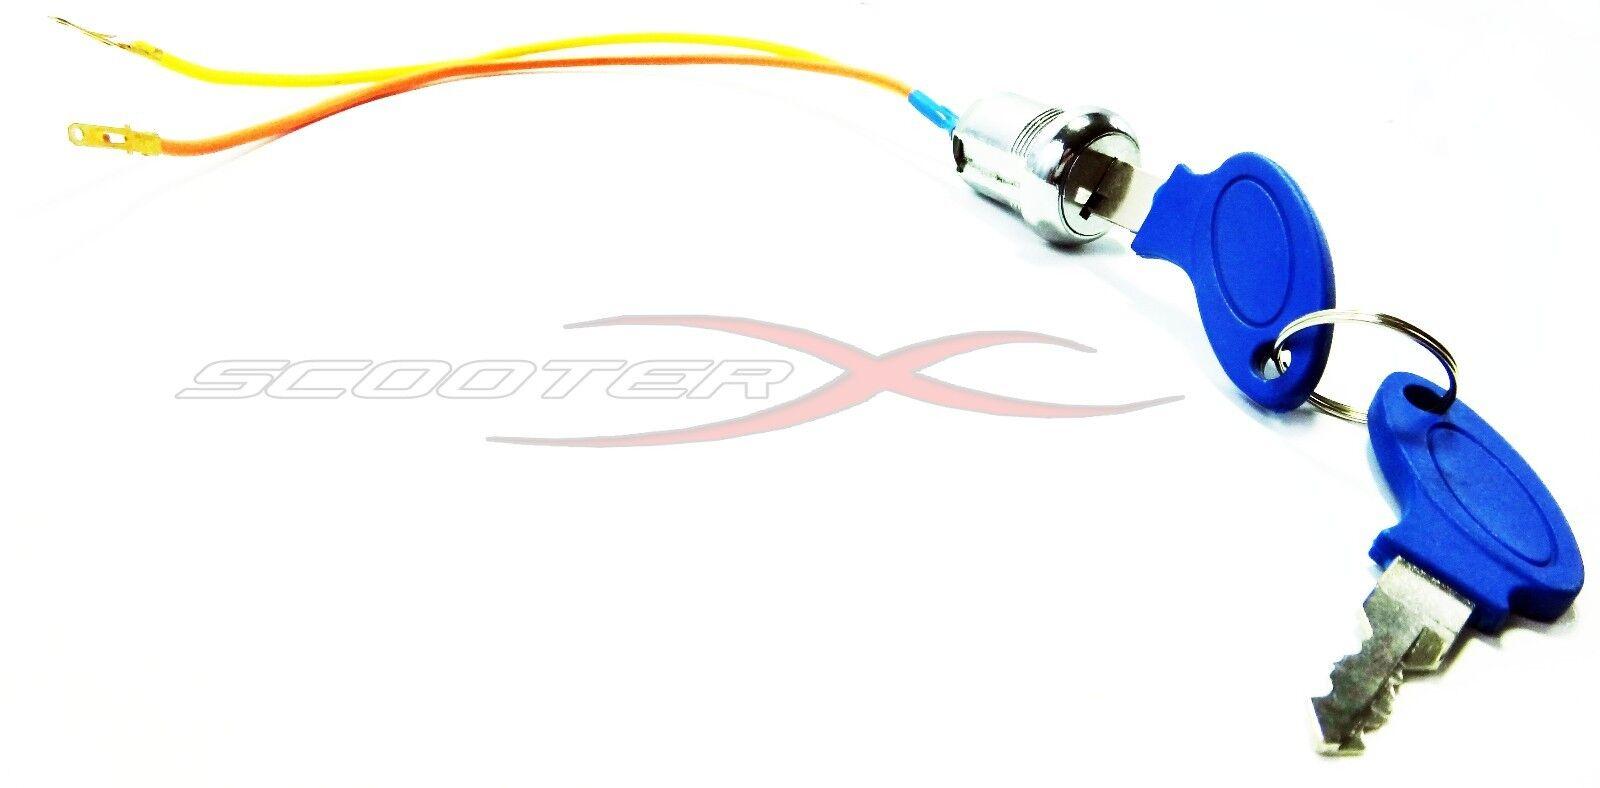 IGNITION SWITCH & Key Super Mini Rocket Pocket Bike Quad Chopper X18 X15  33cc